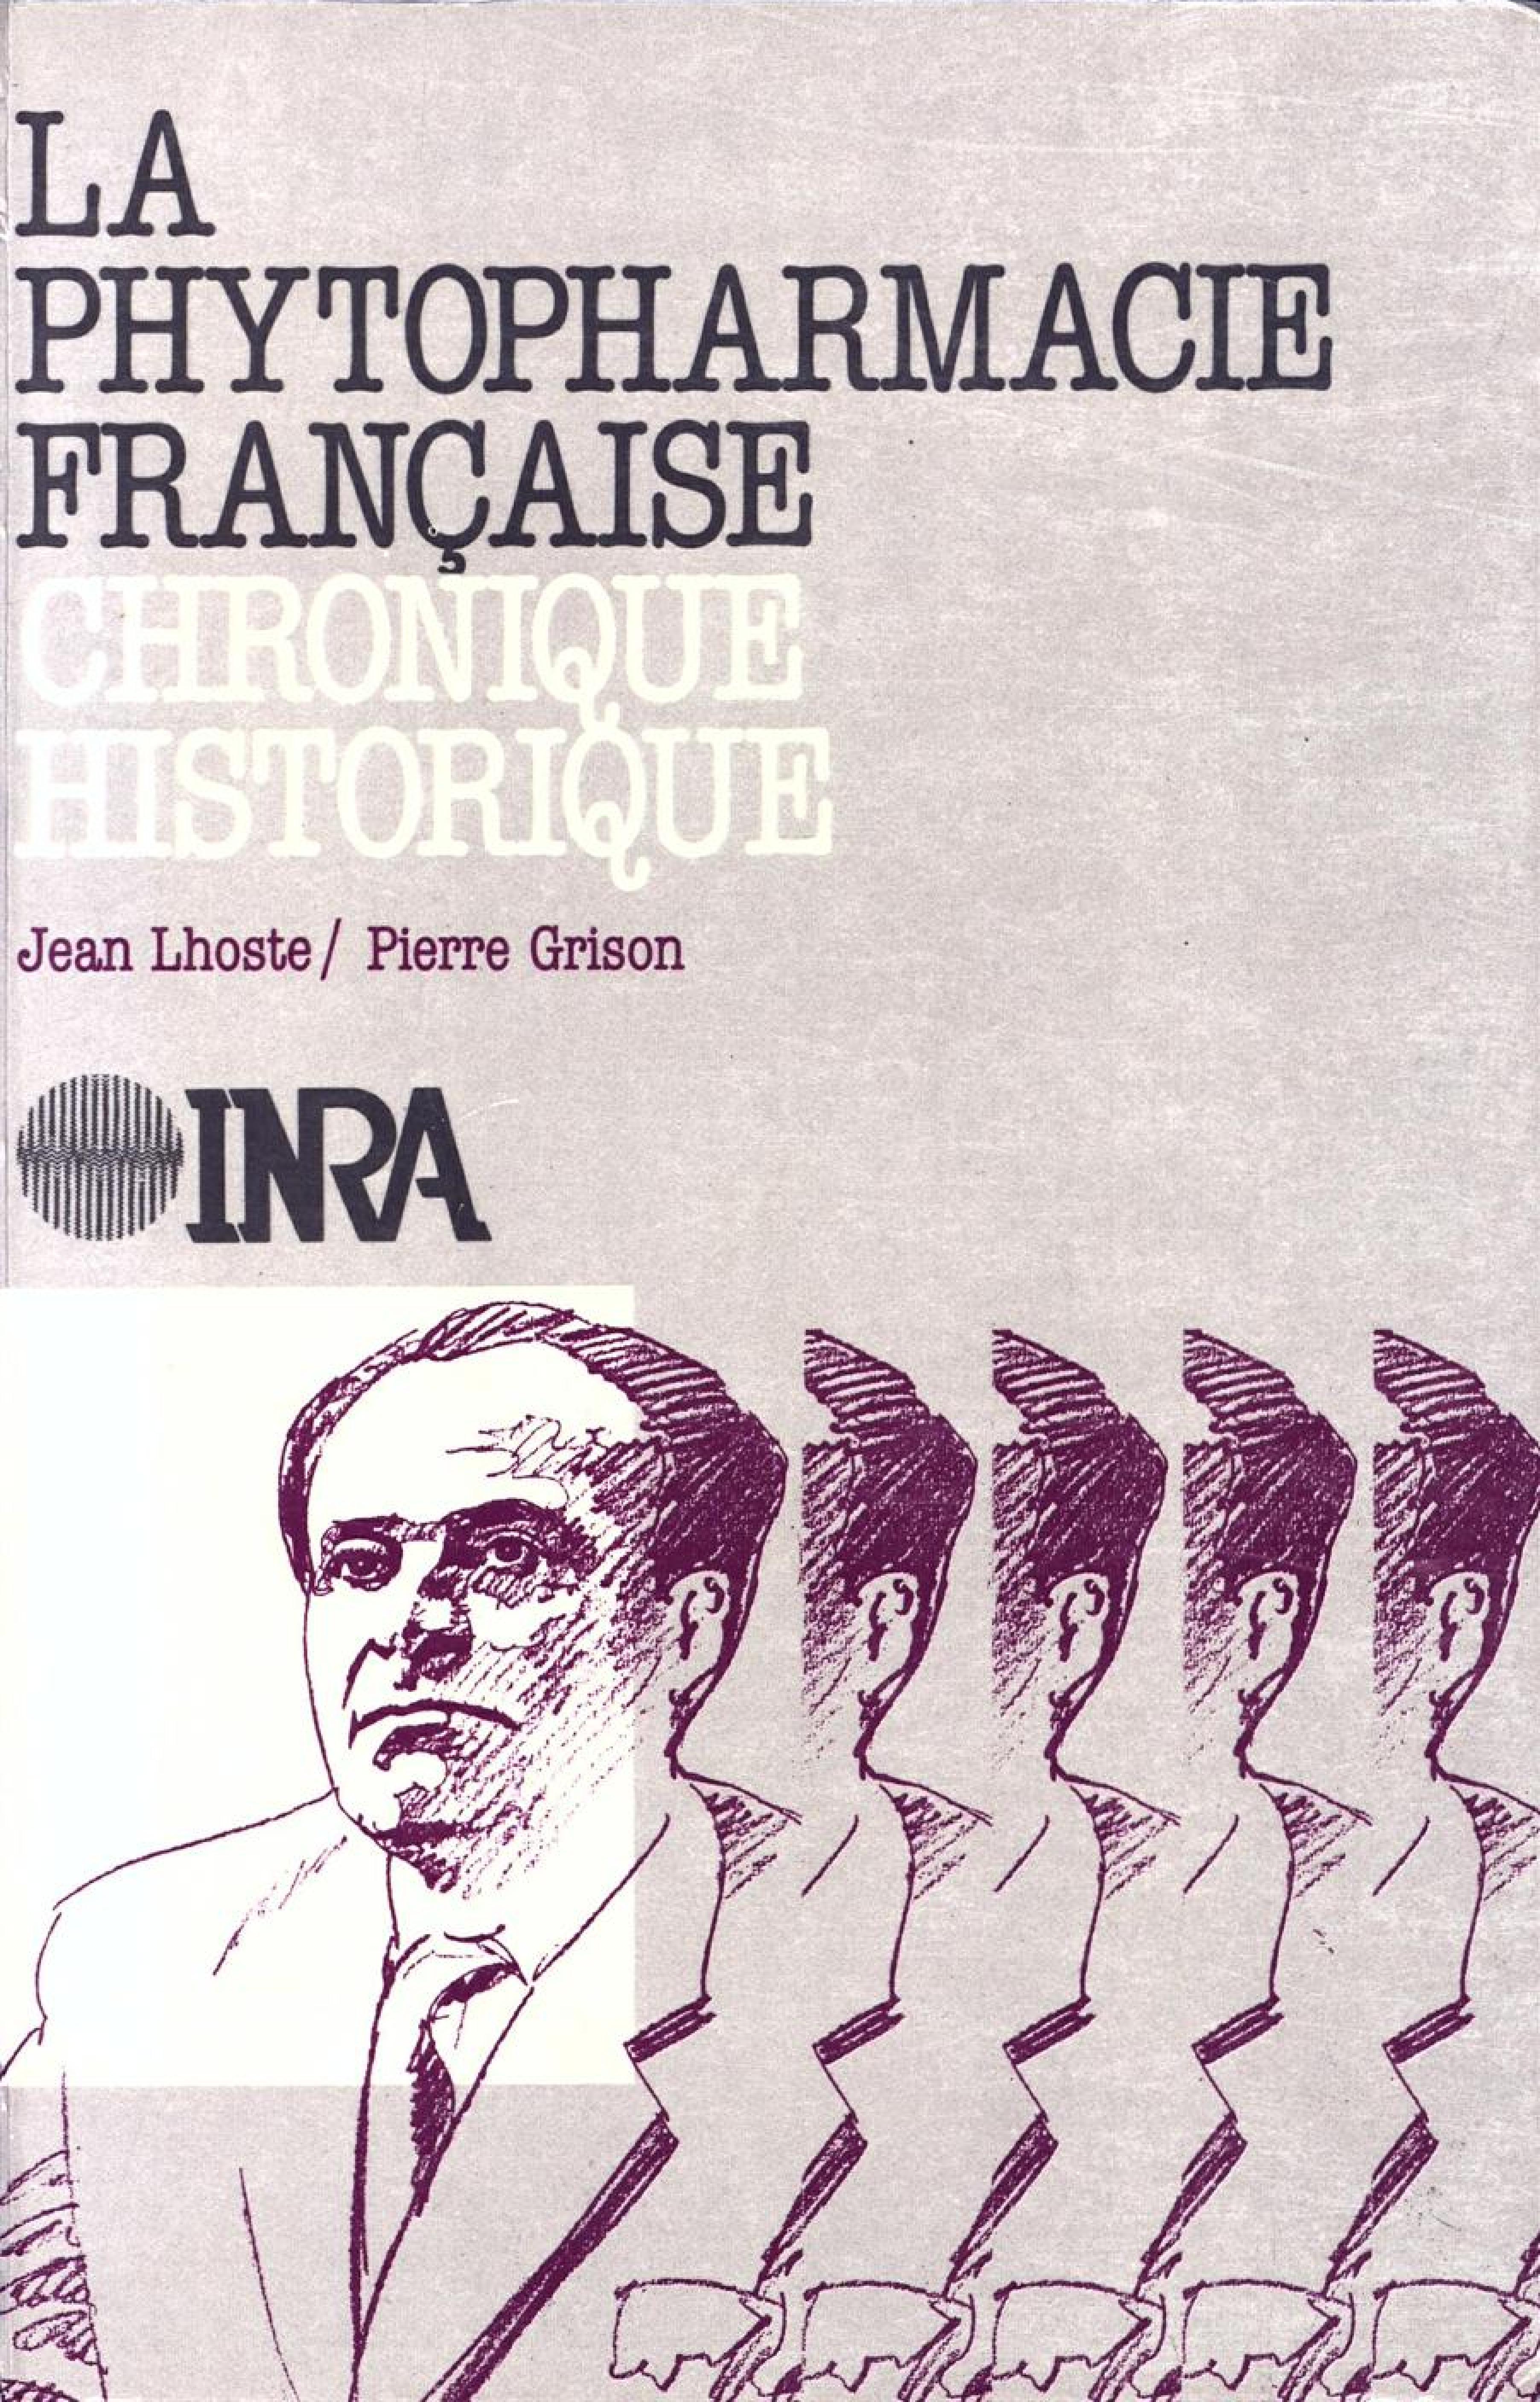 La phytopharmacie francaise - lhoste/la phytopharmacie francaise/chronique historique